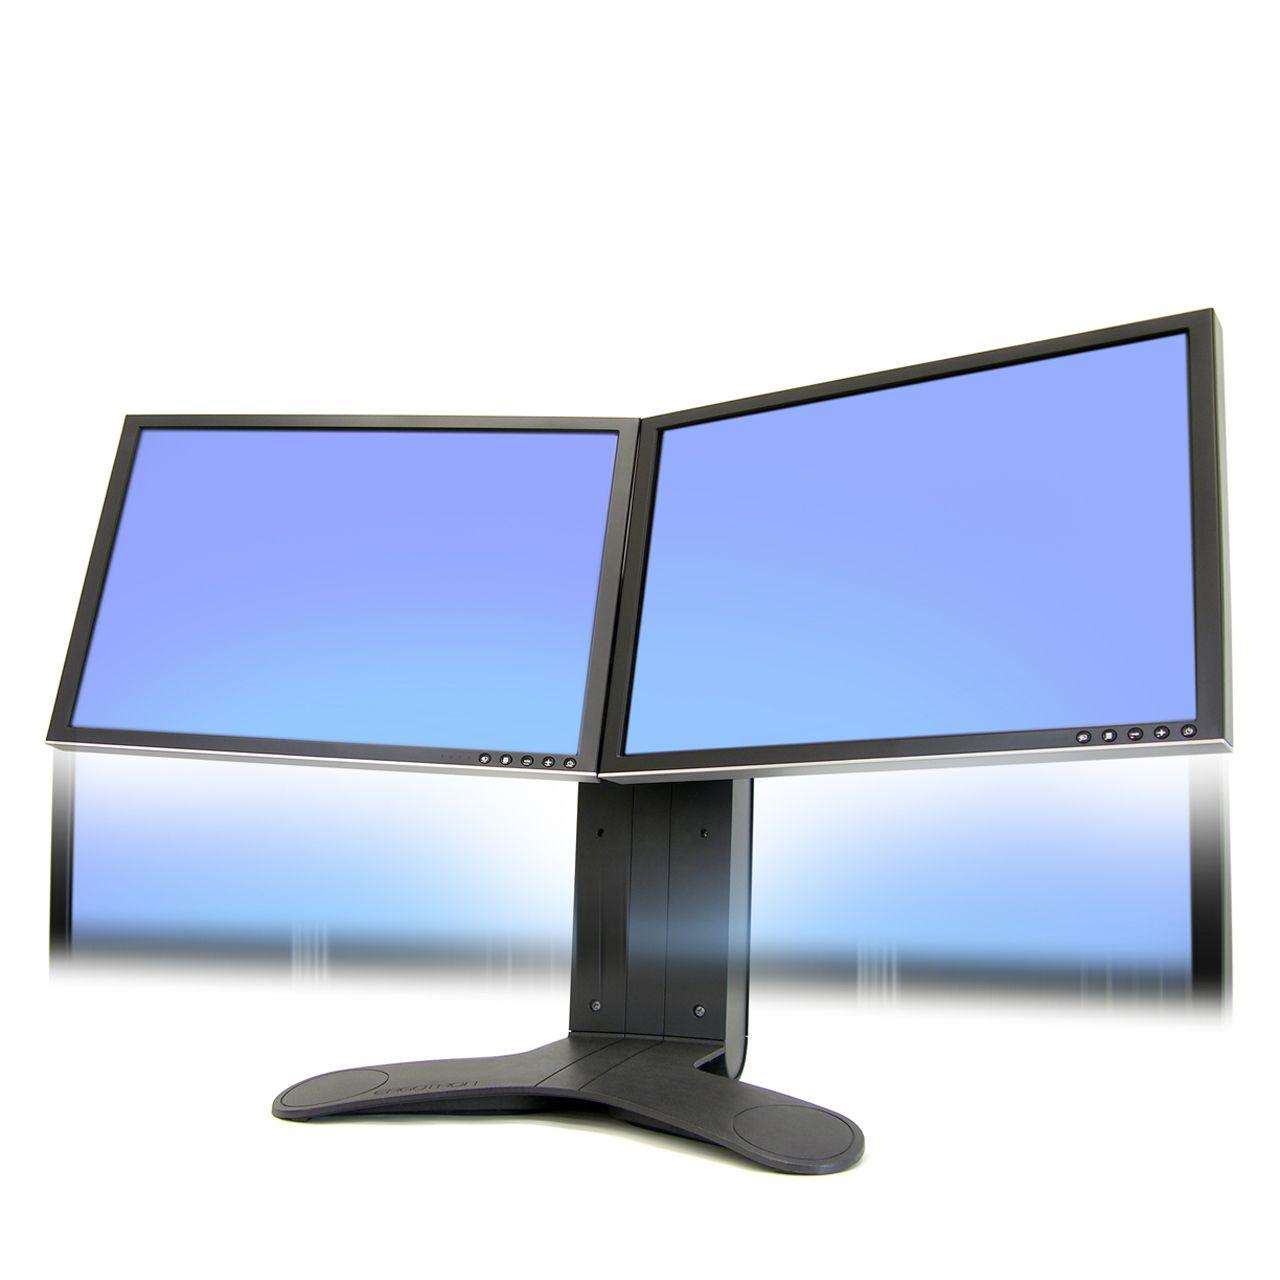 dual lcd stand flatscreenarm monitorsteun ERKALCD202 Voorkant